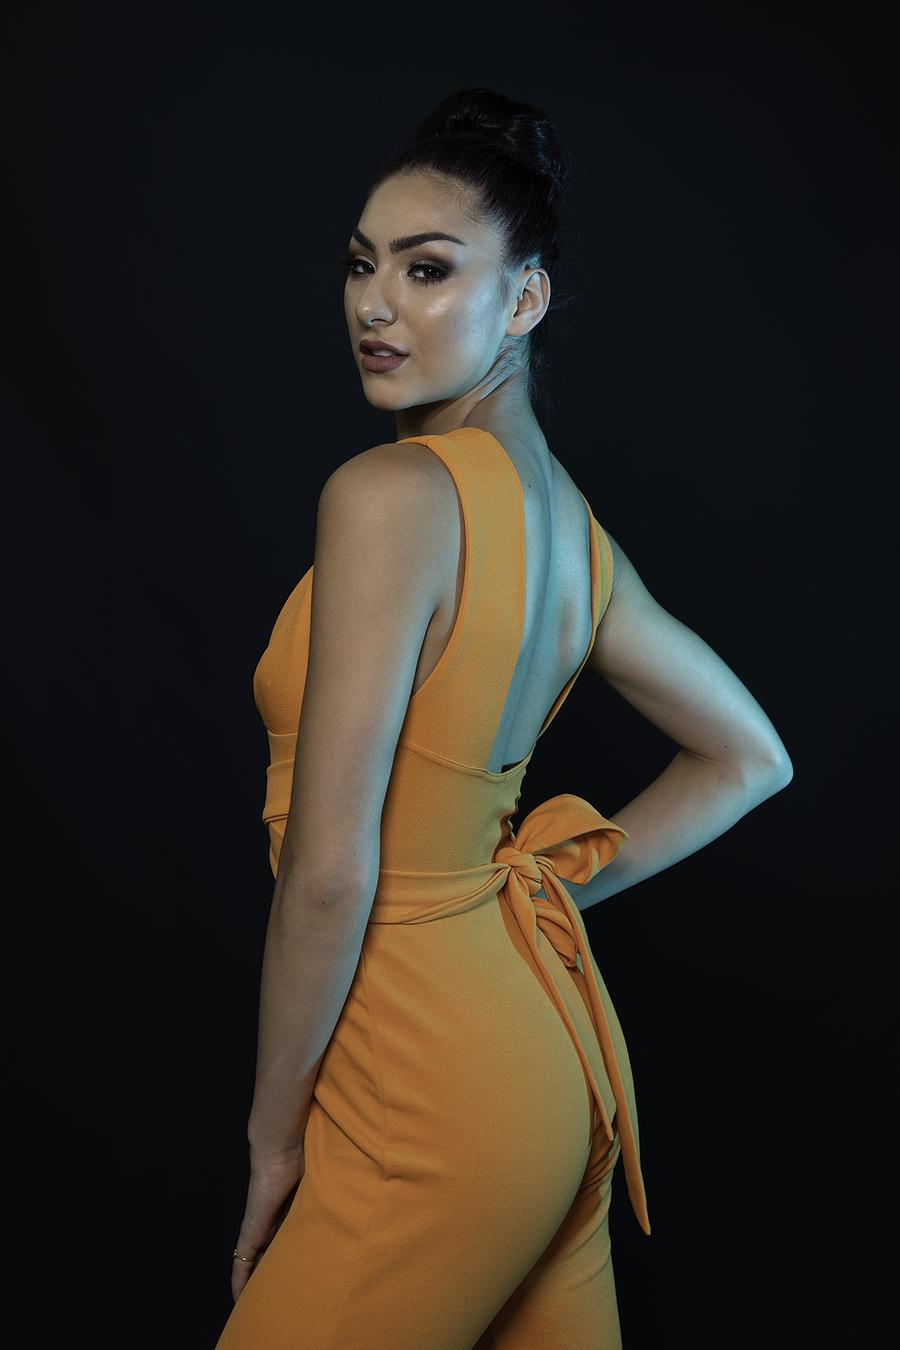 The orange jumpsuit / Photography by Inspire Studios Ltd, Model Elesha Eden, Taken at Inspire Studios Ltd / Uploaded 22nd July 2018 @ 09:29 AM